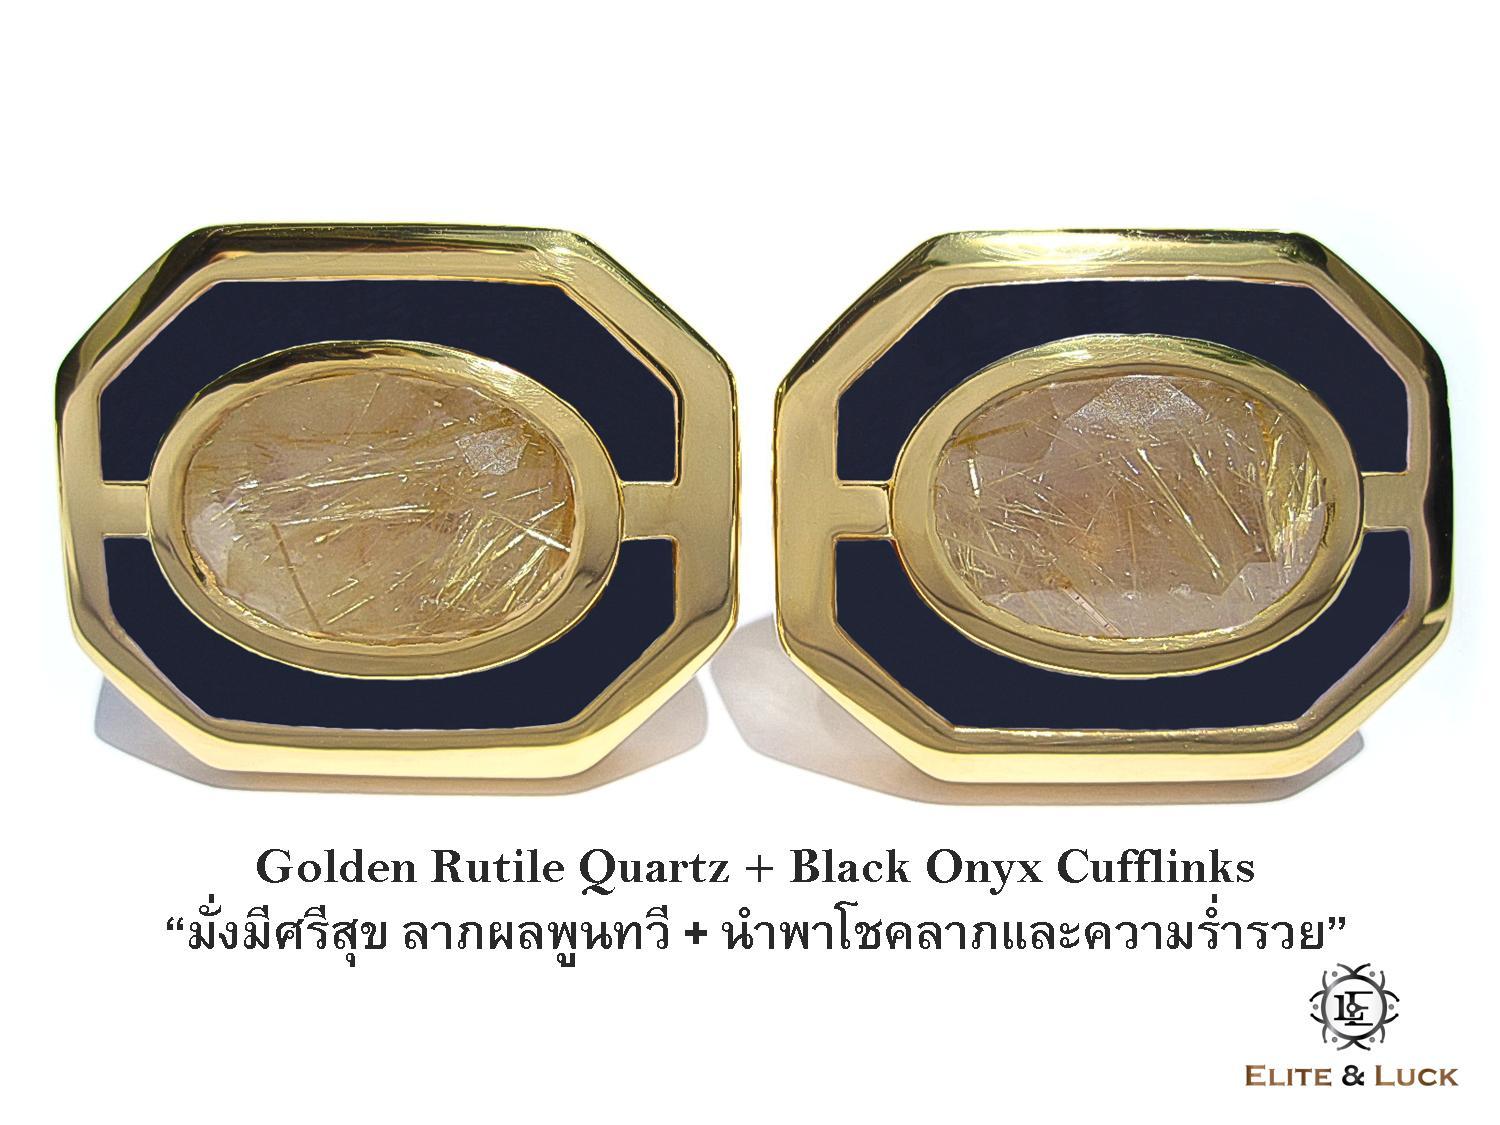 Golden Rutile Quartz + Black Onyx Sterling Silver Cufflinks สี 18K Yellow Gold รุ่น Charming